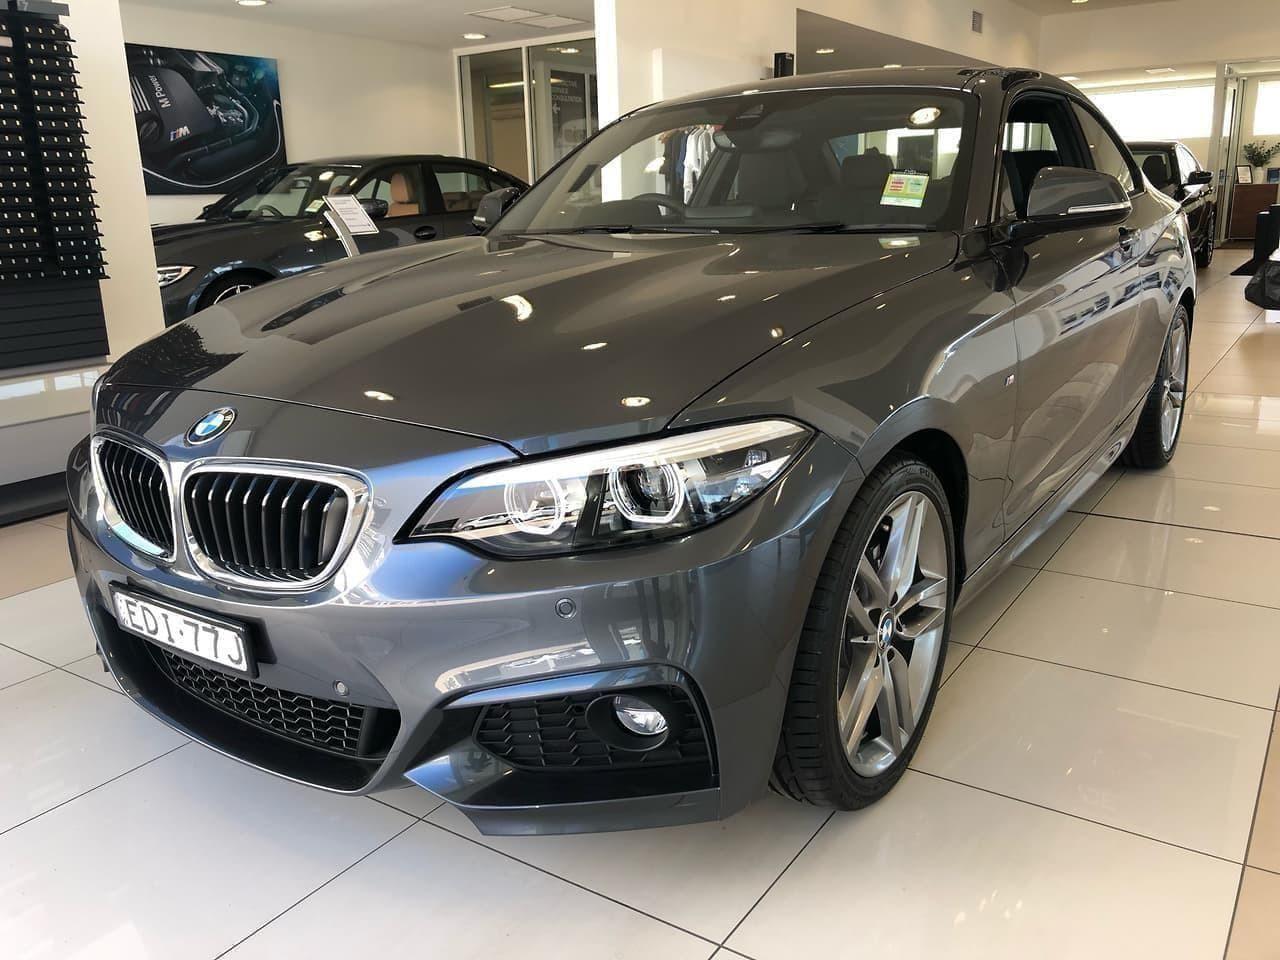 2018 BMW 2 Series F22 LCI 220i Coupe